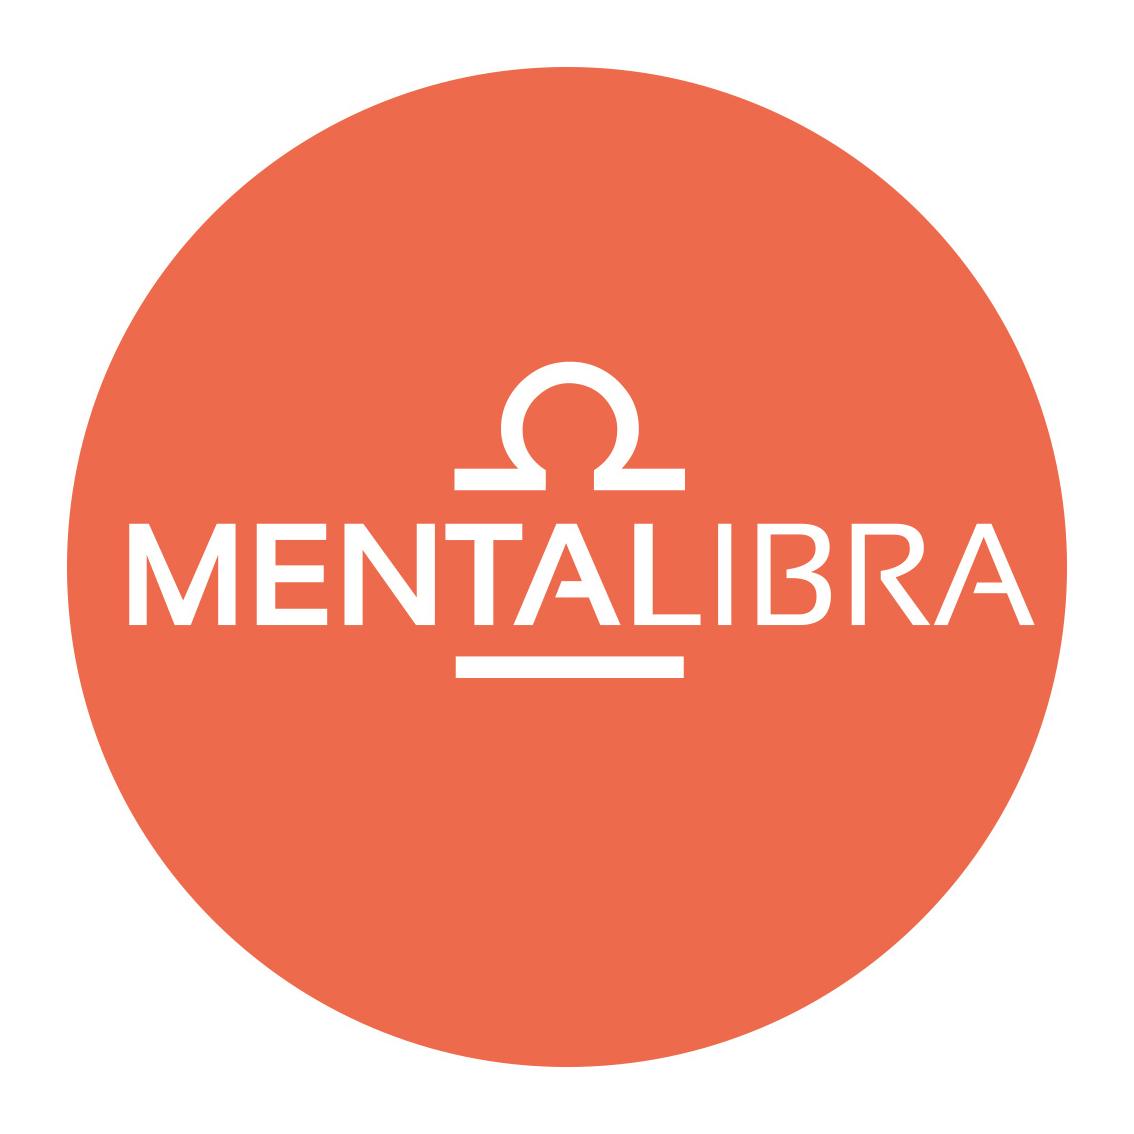 mentalibra_logo